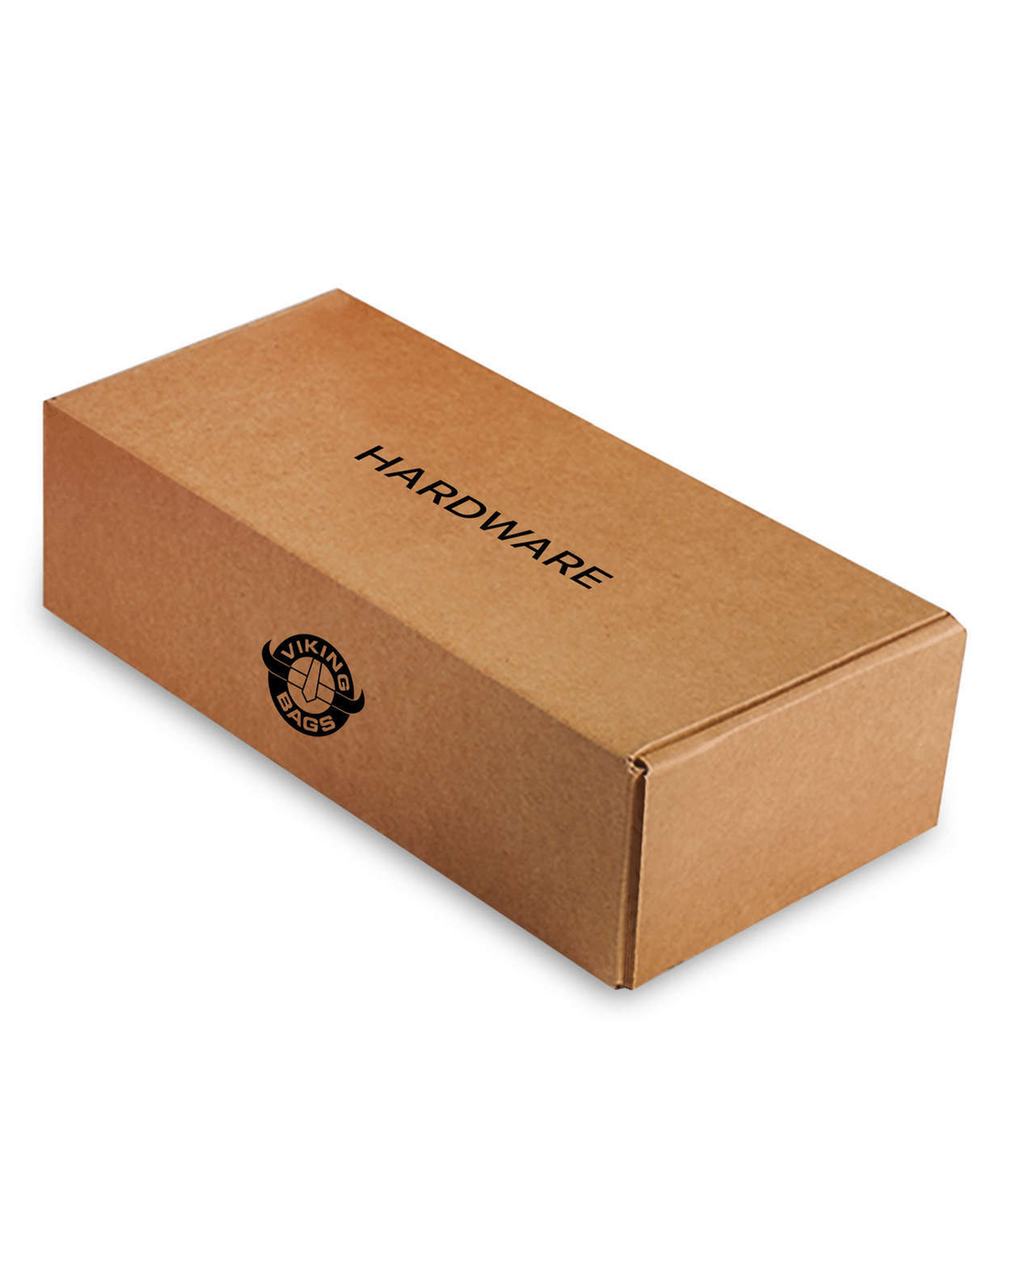 Victory Boardwalk Trianon Motorcycle Saddlebags Hardware Box